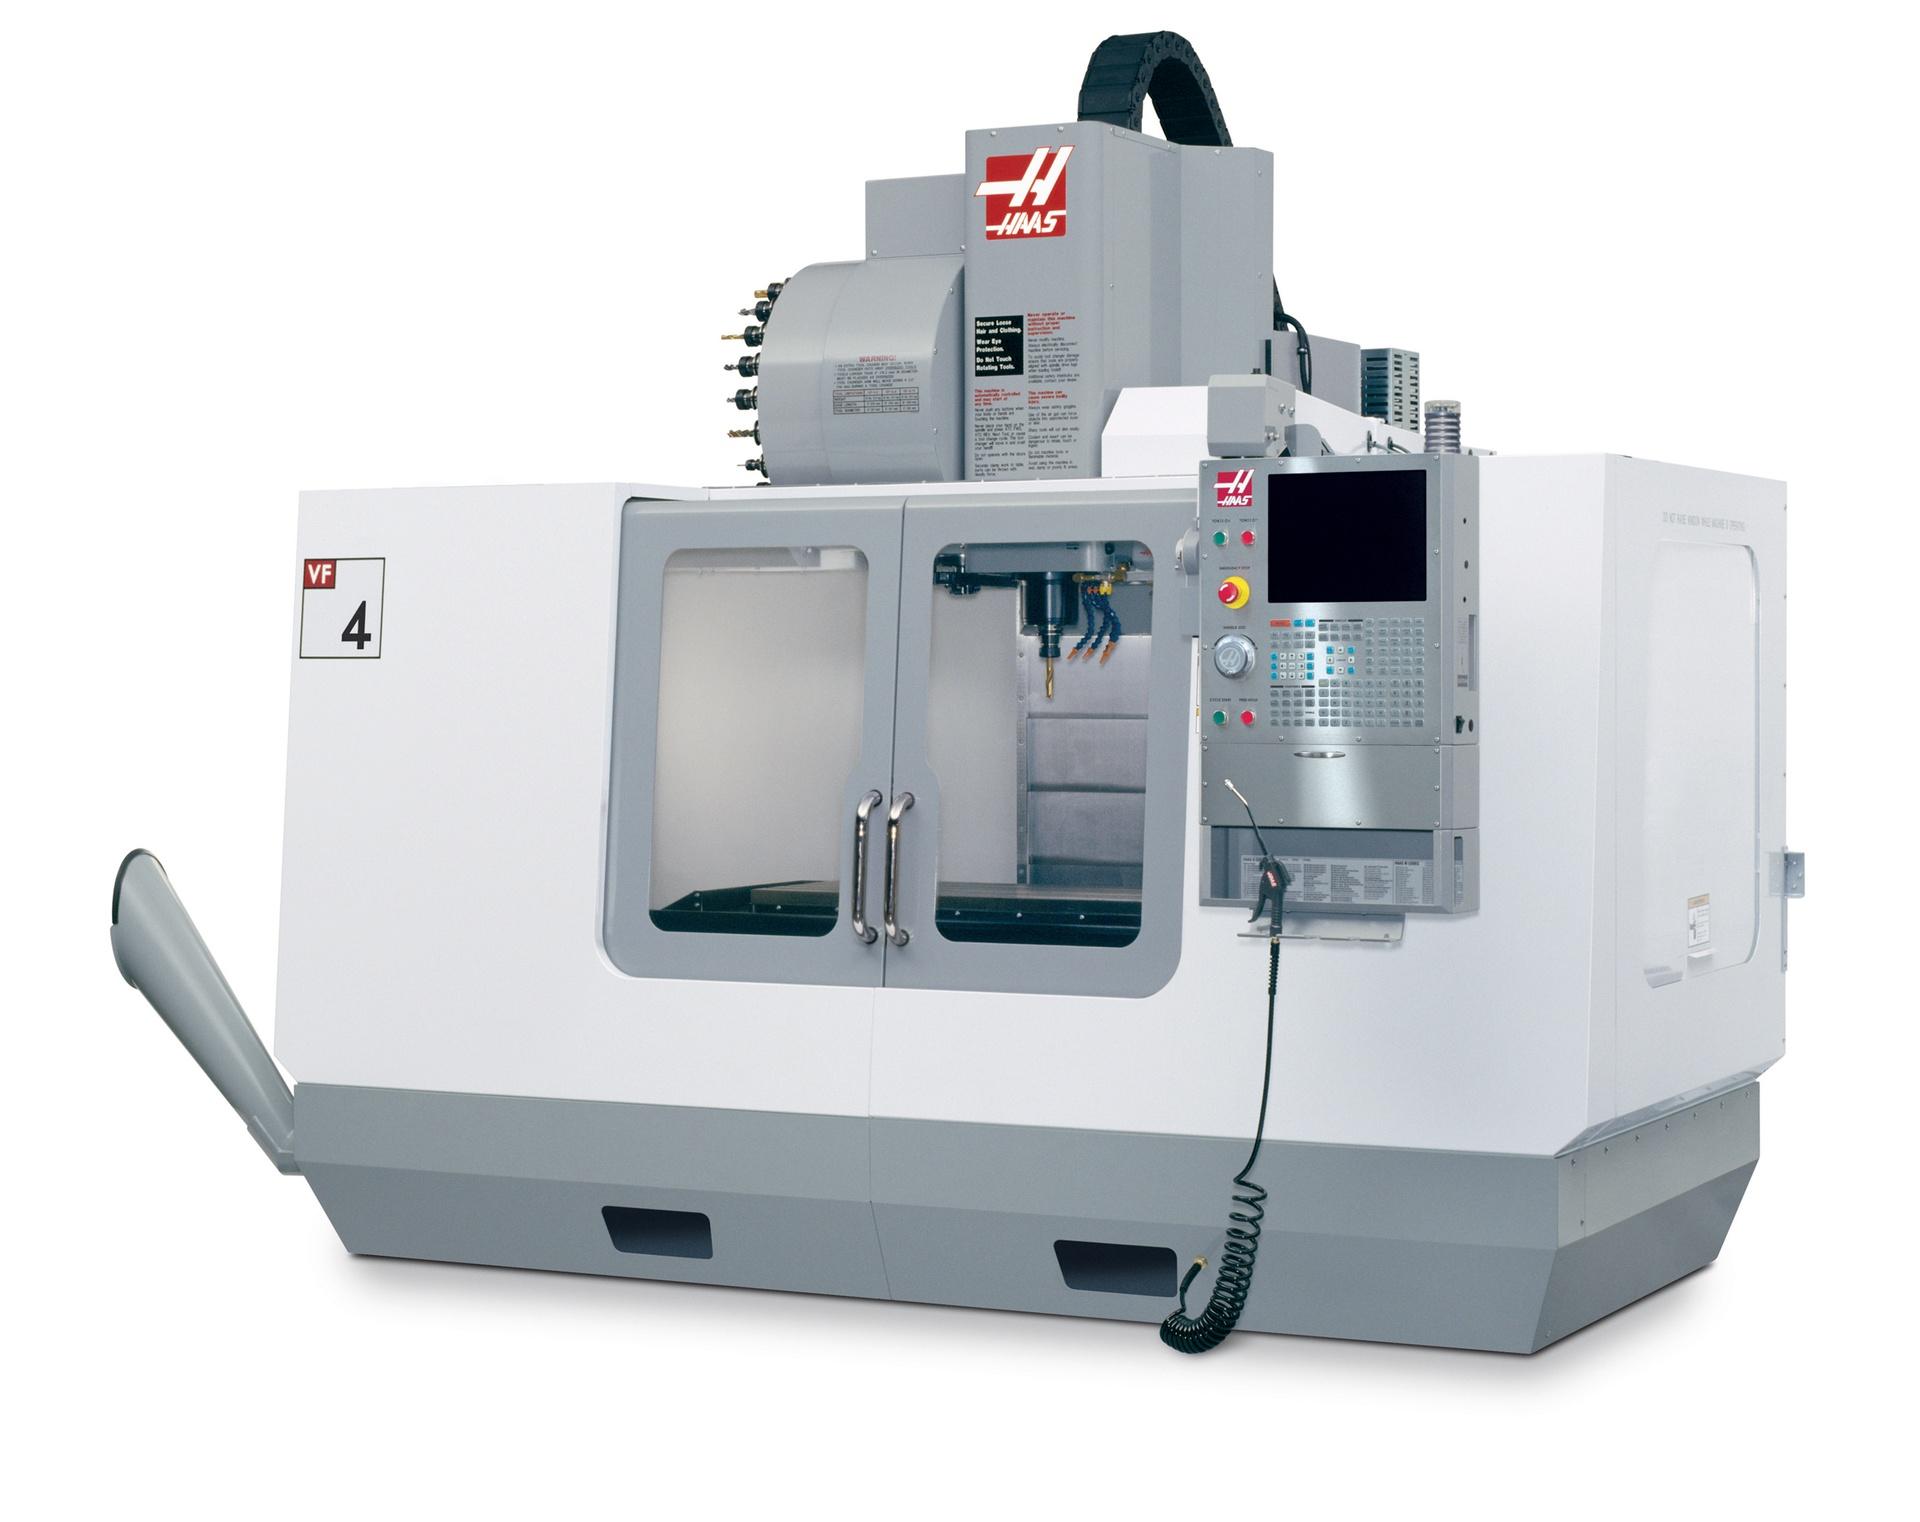 Haas VF4 - Vertical Machining Center